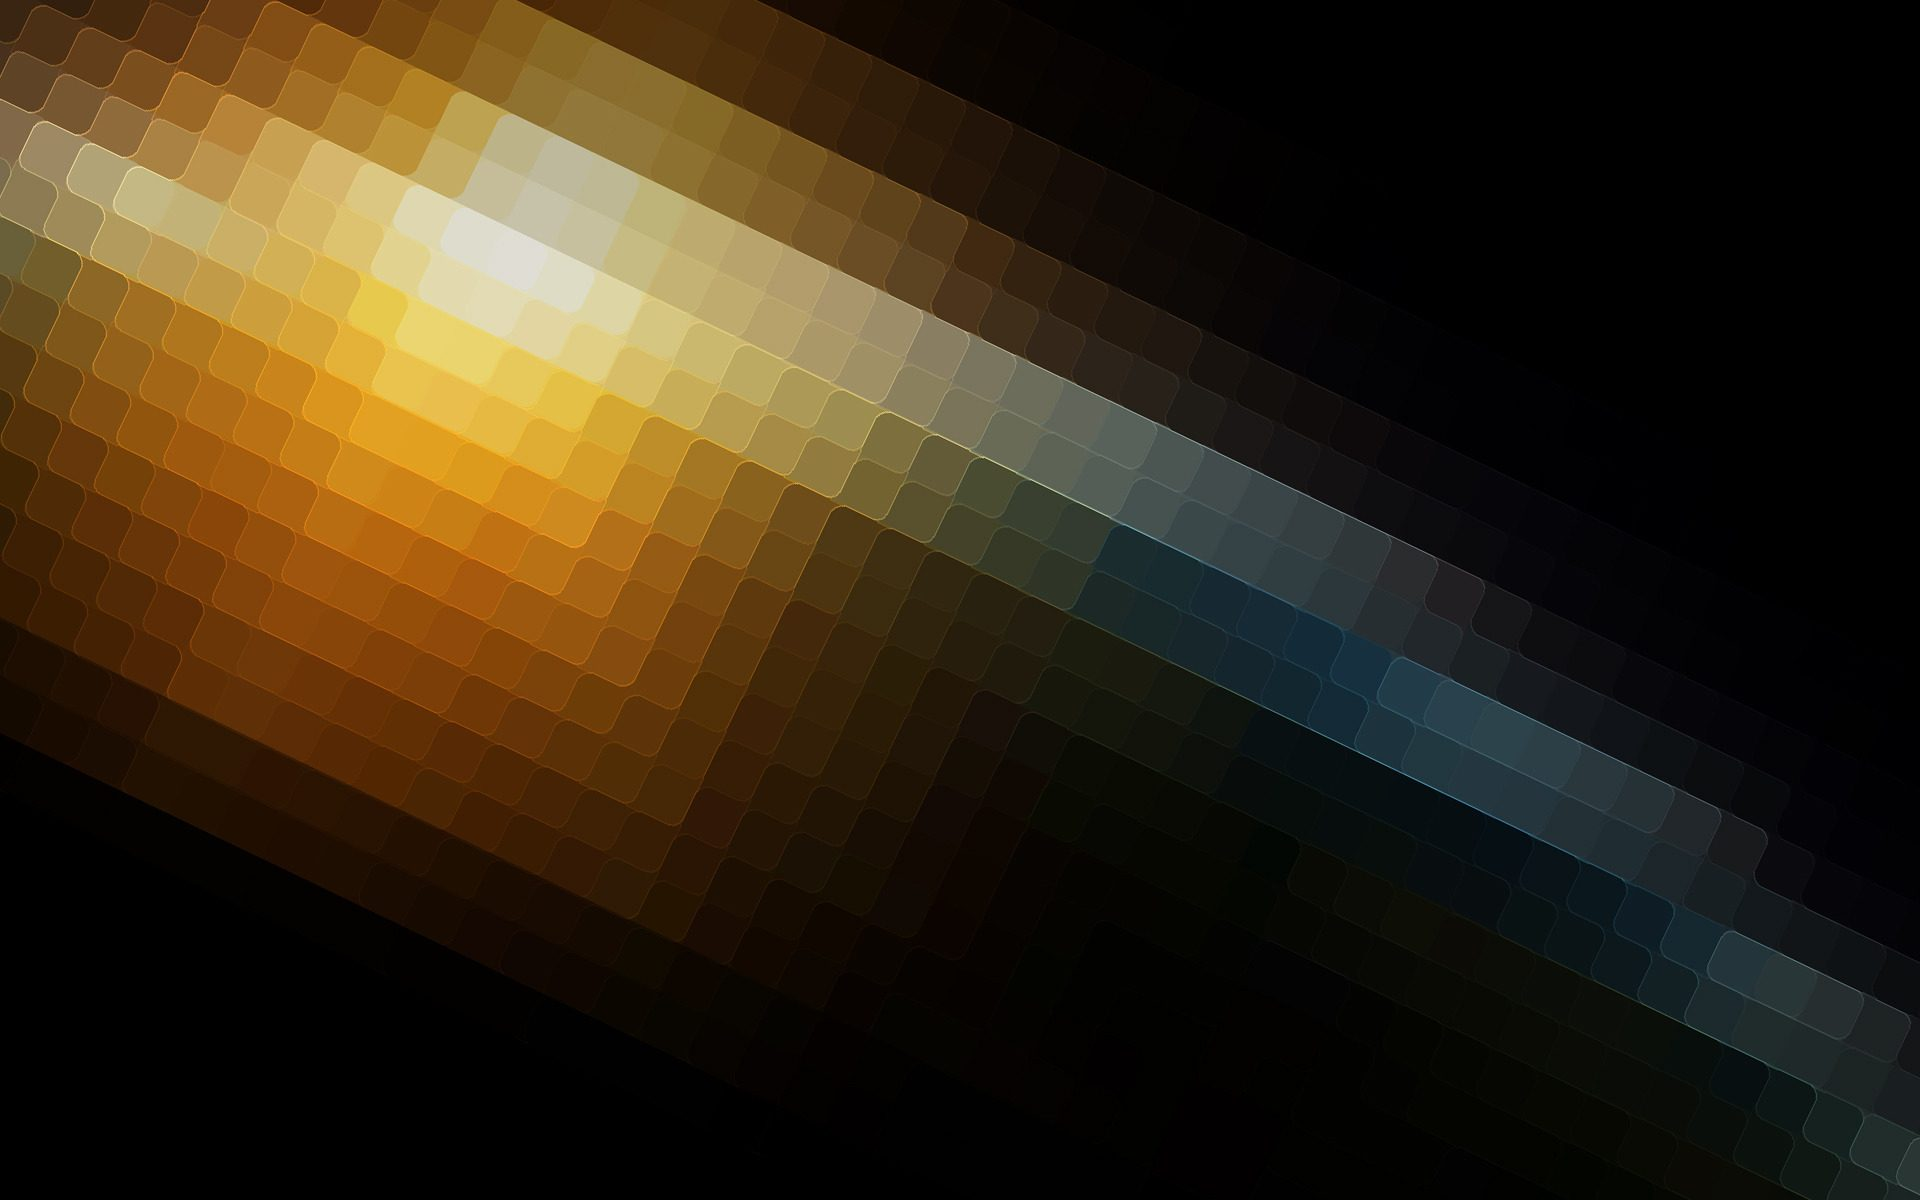 clients Clients Wallpaper Abstract Art Graphics Pixels Squares Background Wallpaper 1920x1200